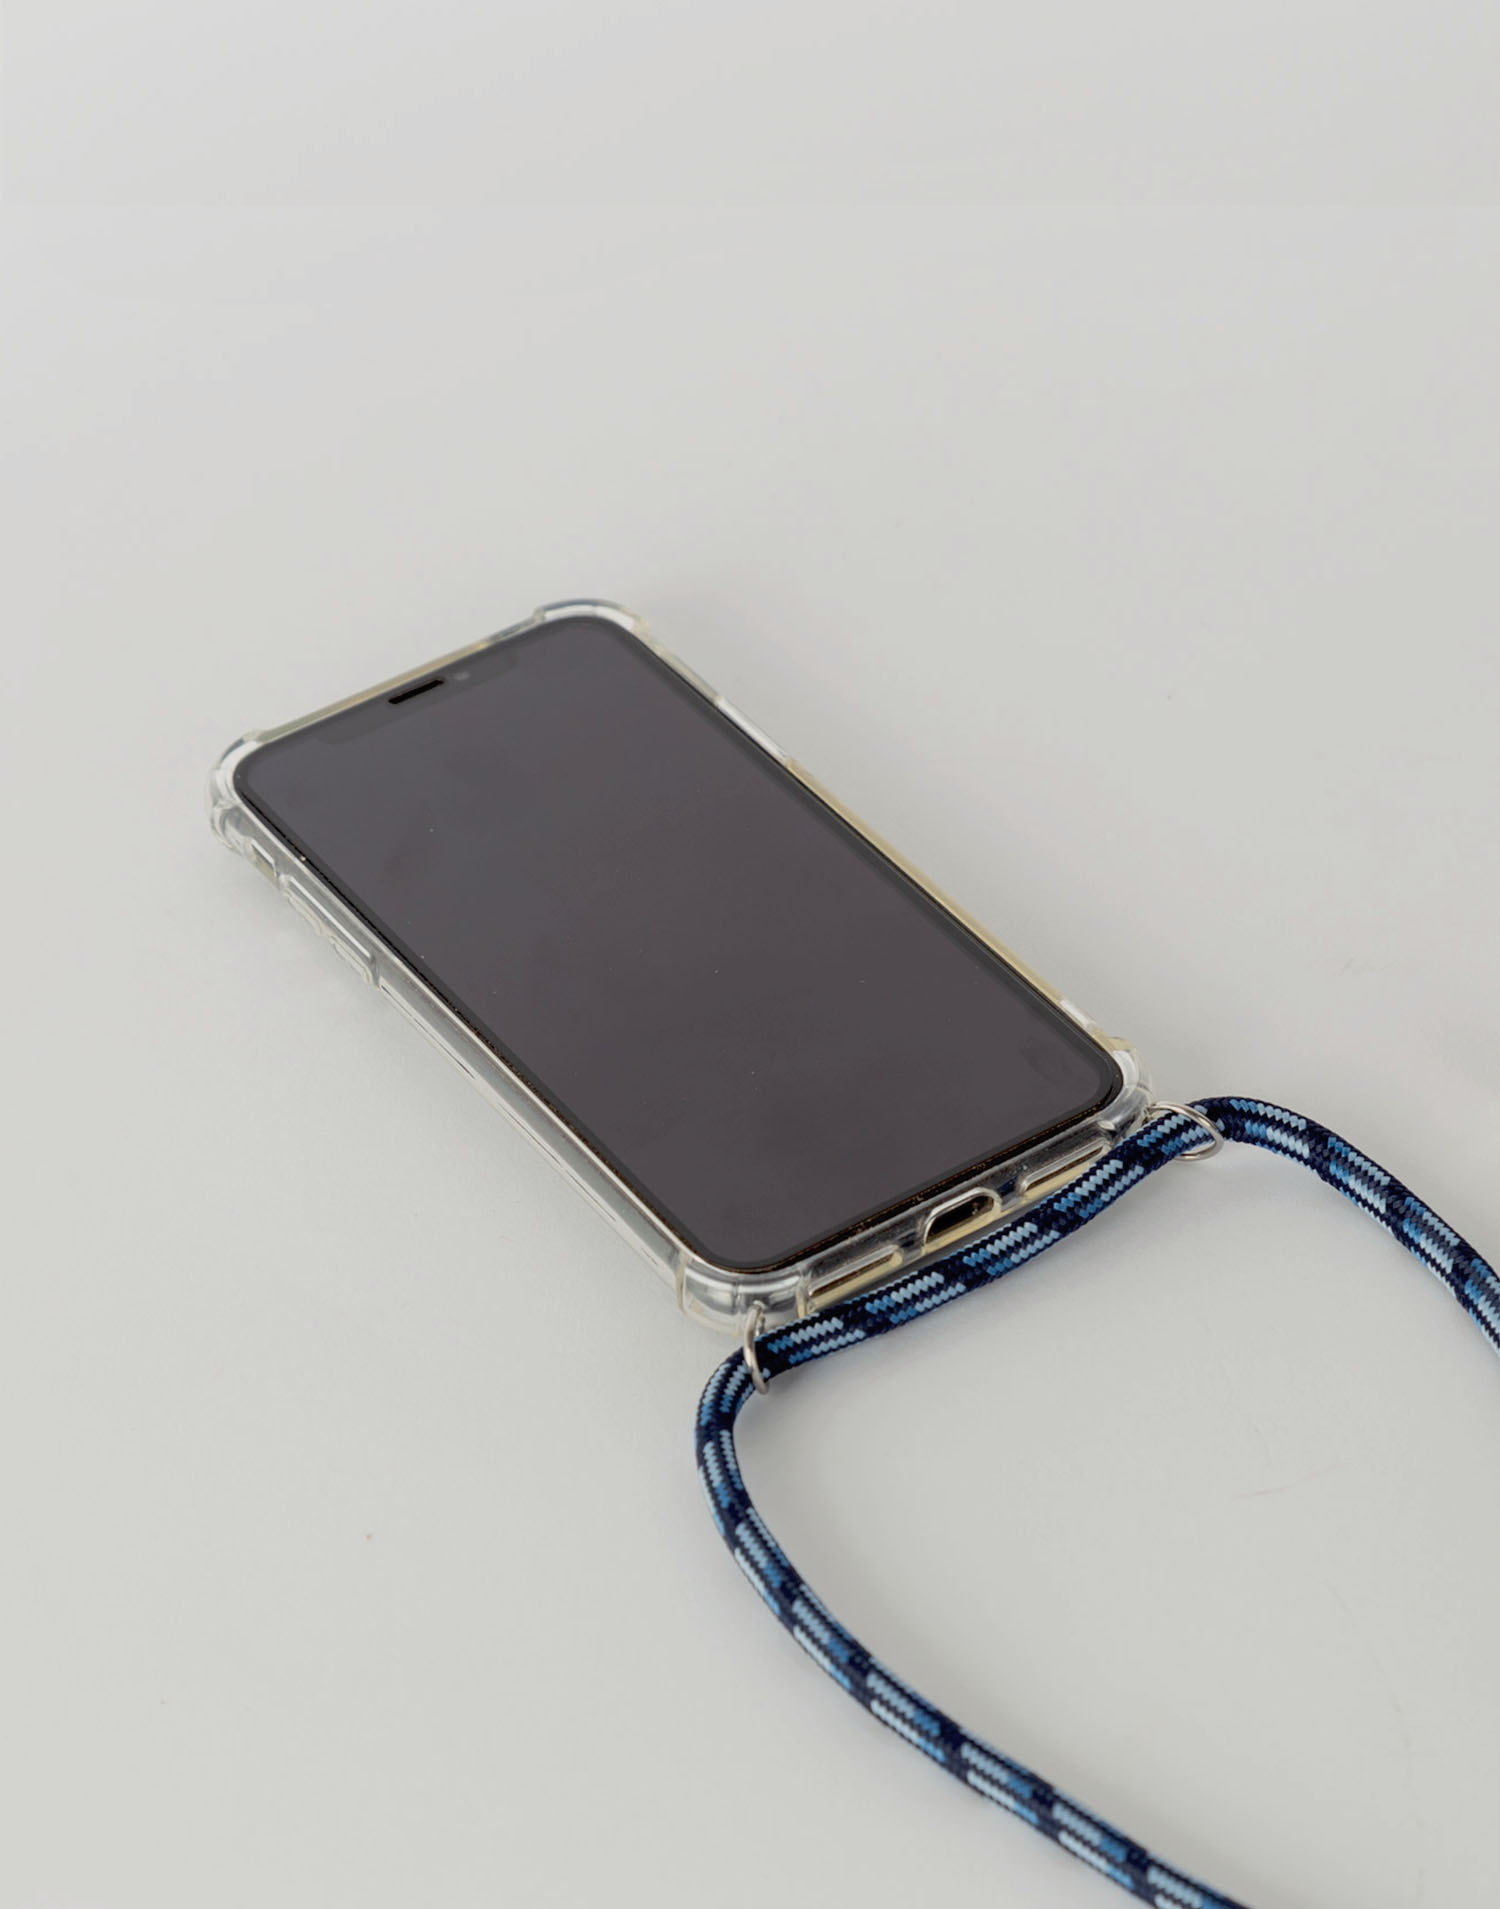 Crossbody iphone x case